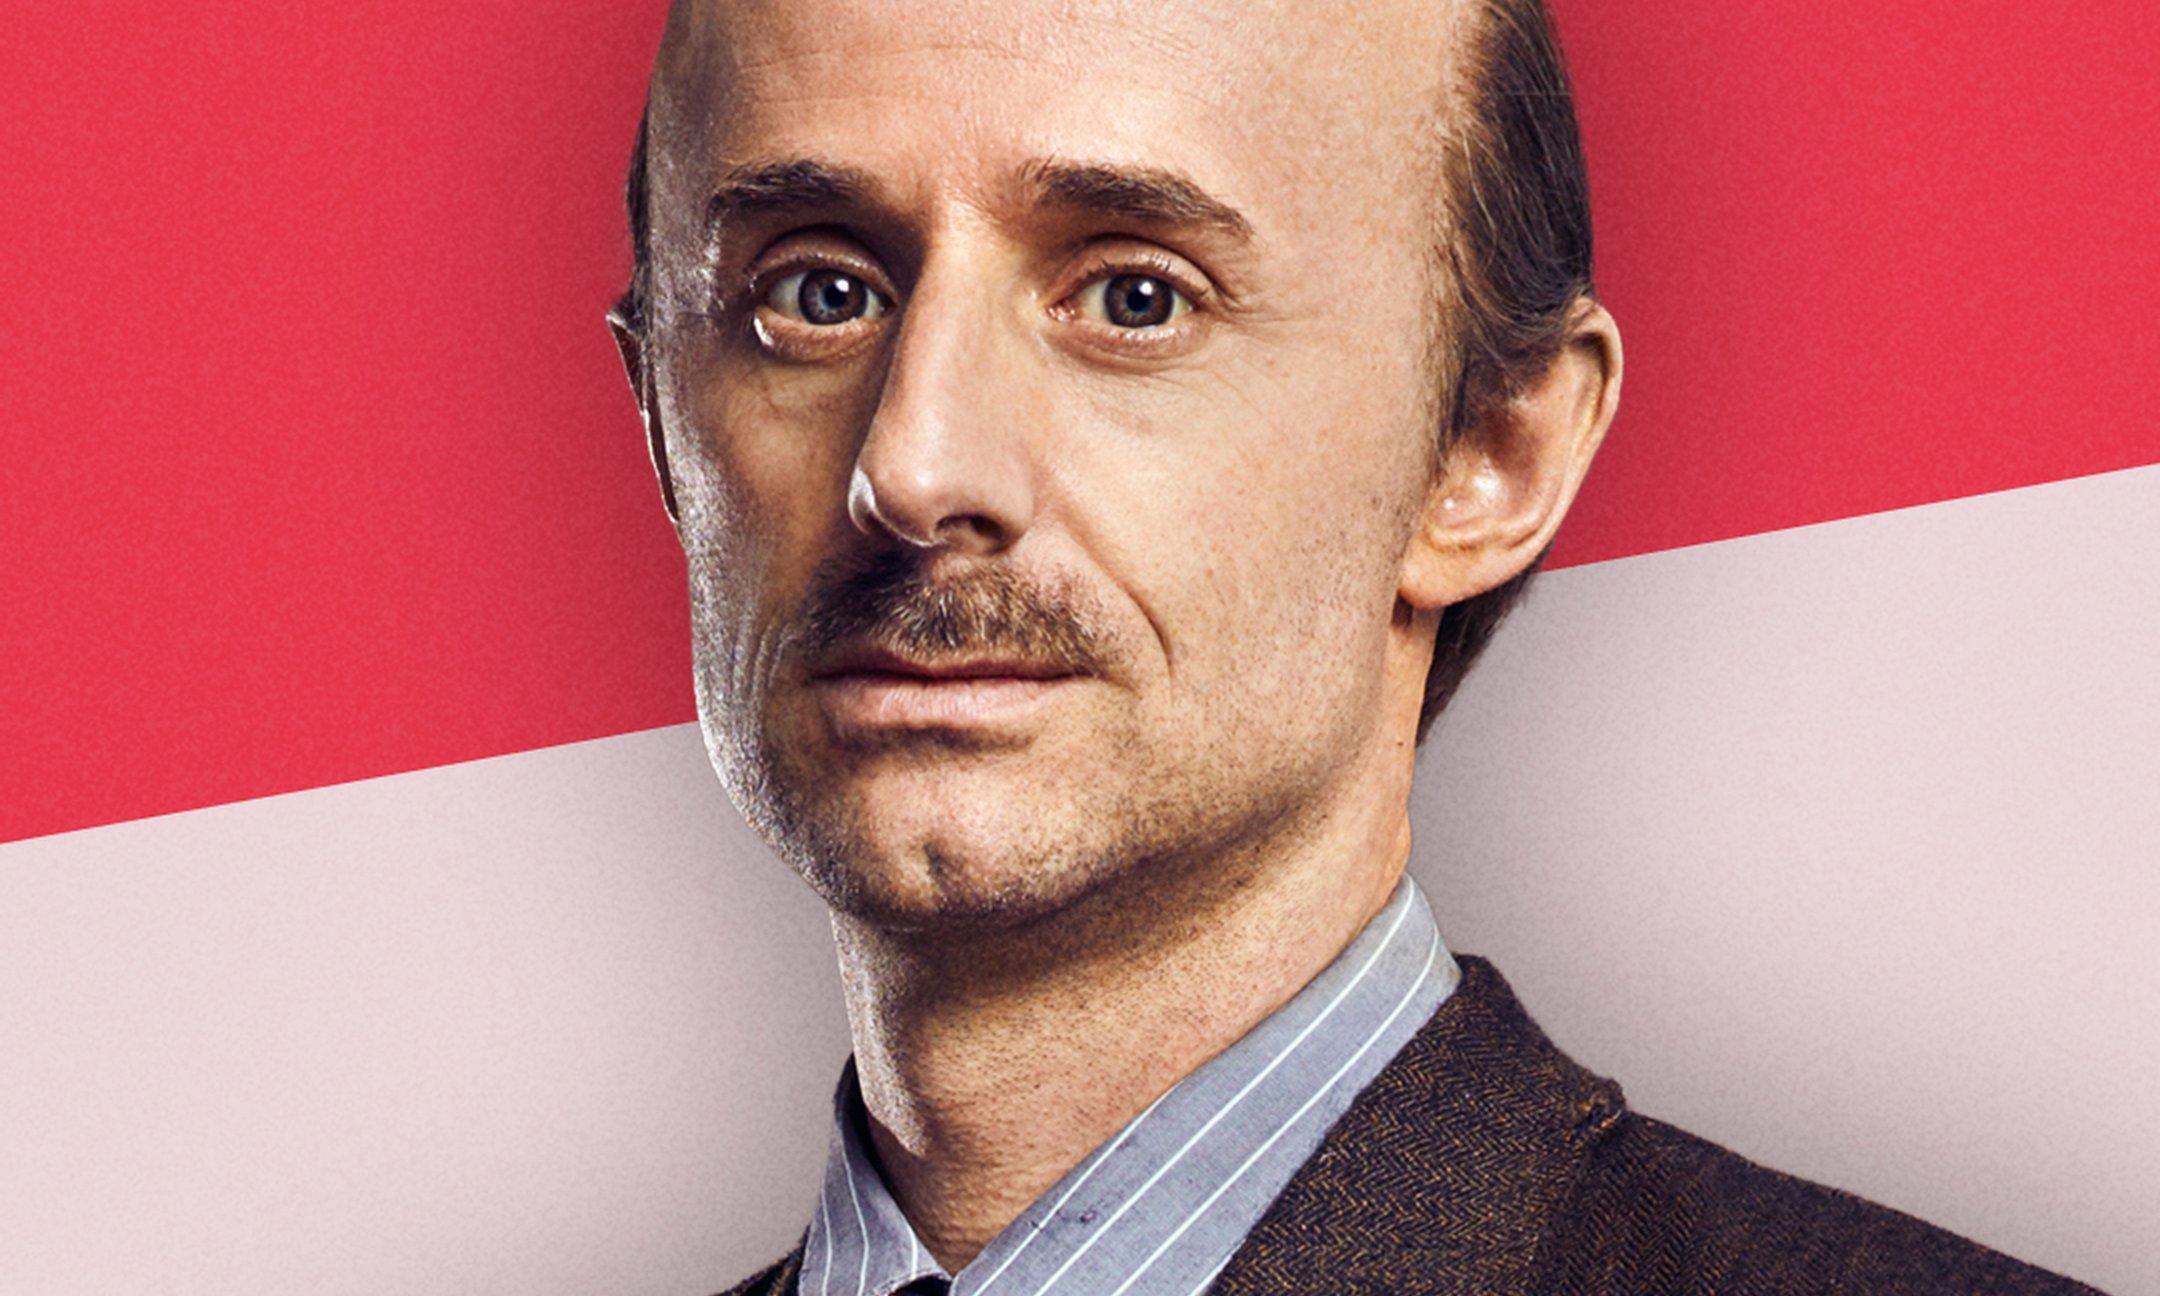 Noël van Santen (Otto Frank, Anne's father)